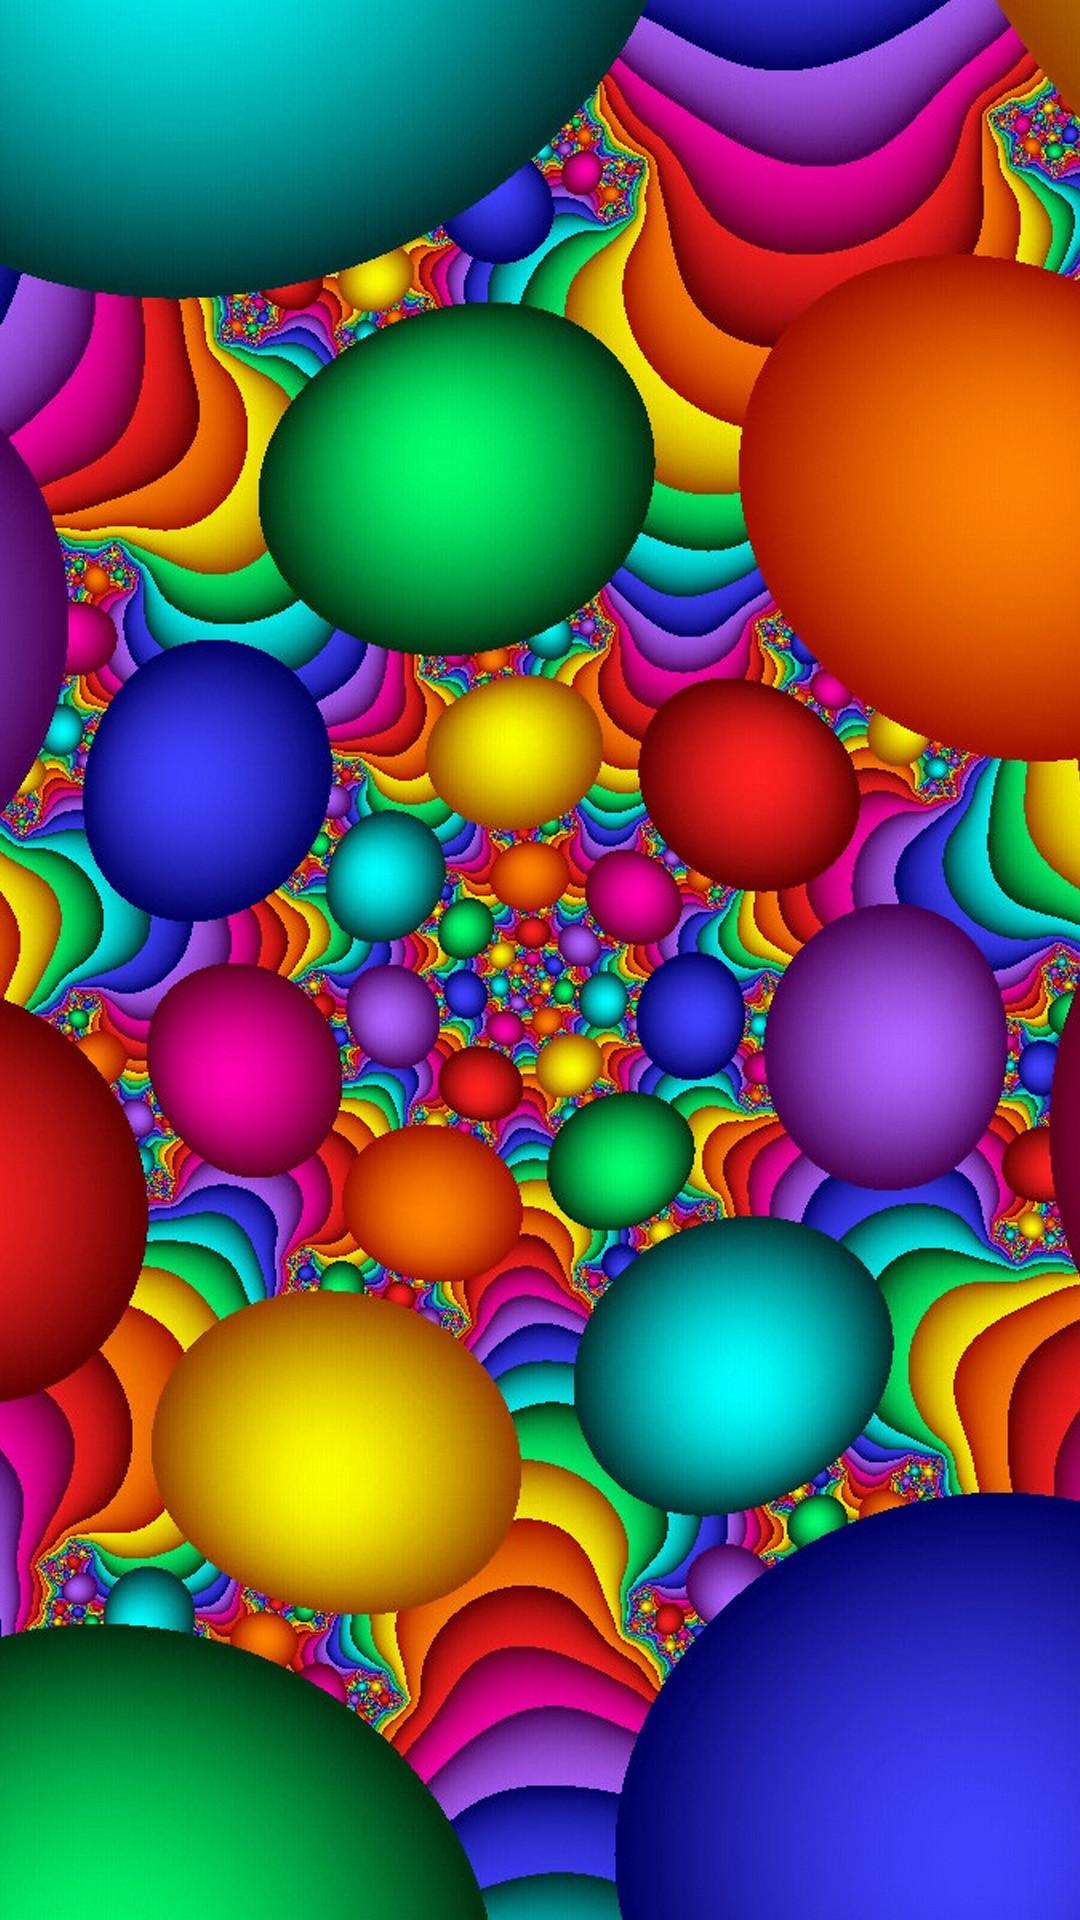 3d Color Balls Wallpaper - Colorful Balloons Background Hd - HD Wallpaper